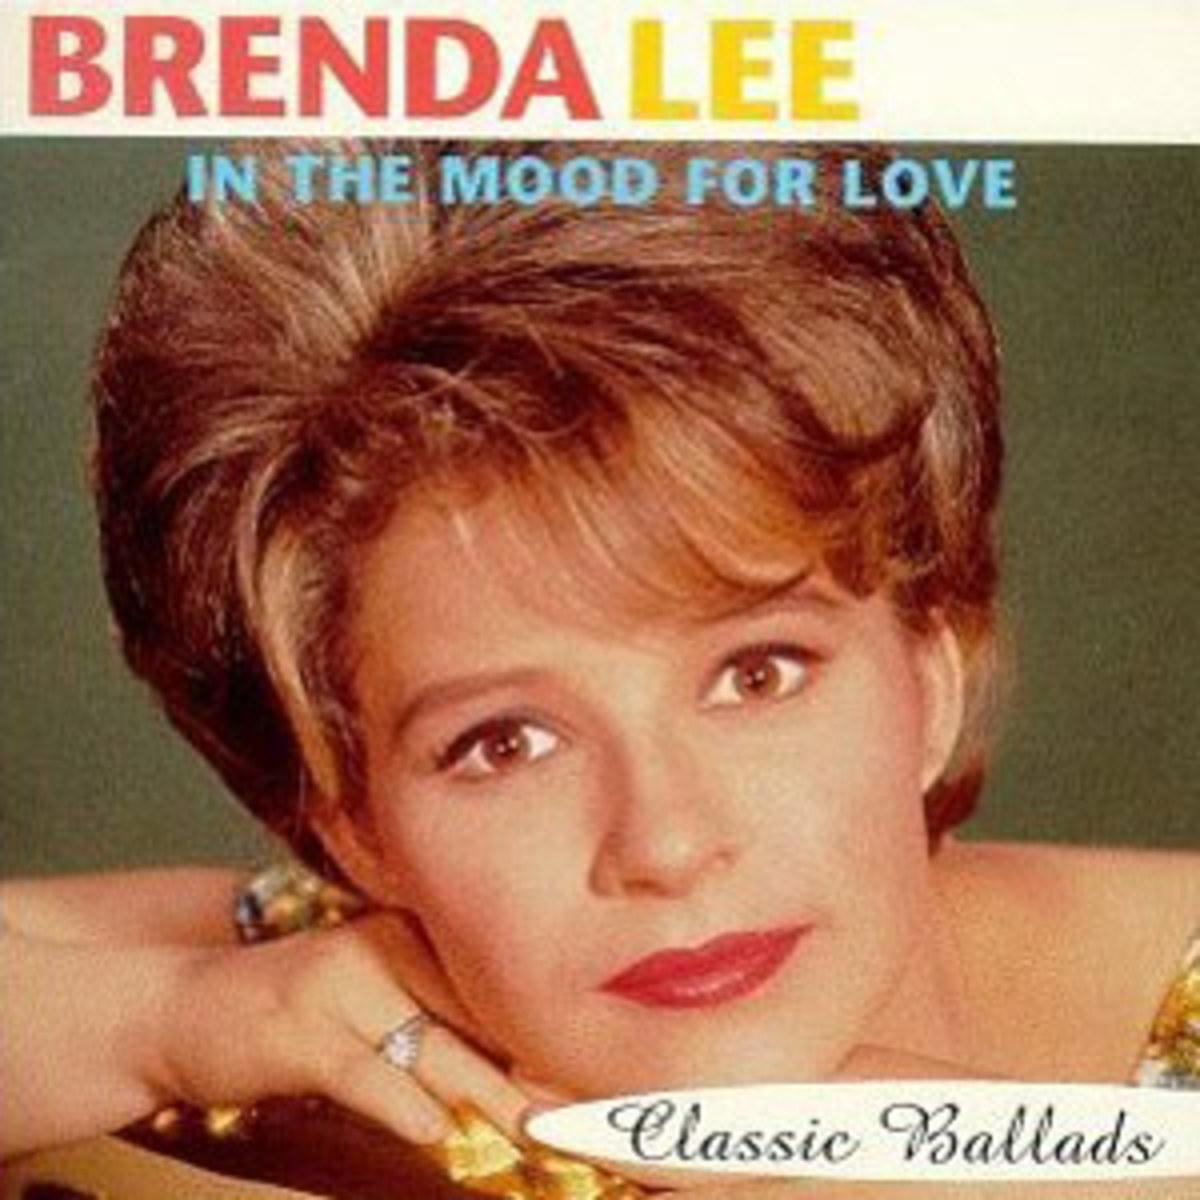 Brenda Lee -1972 Single